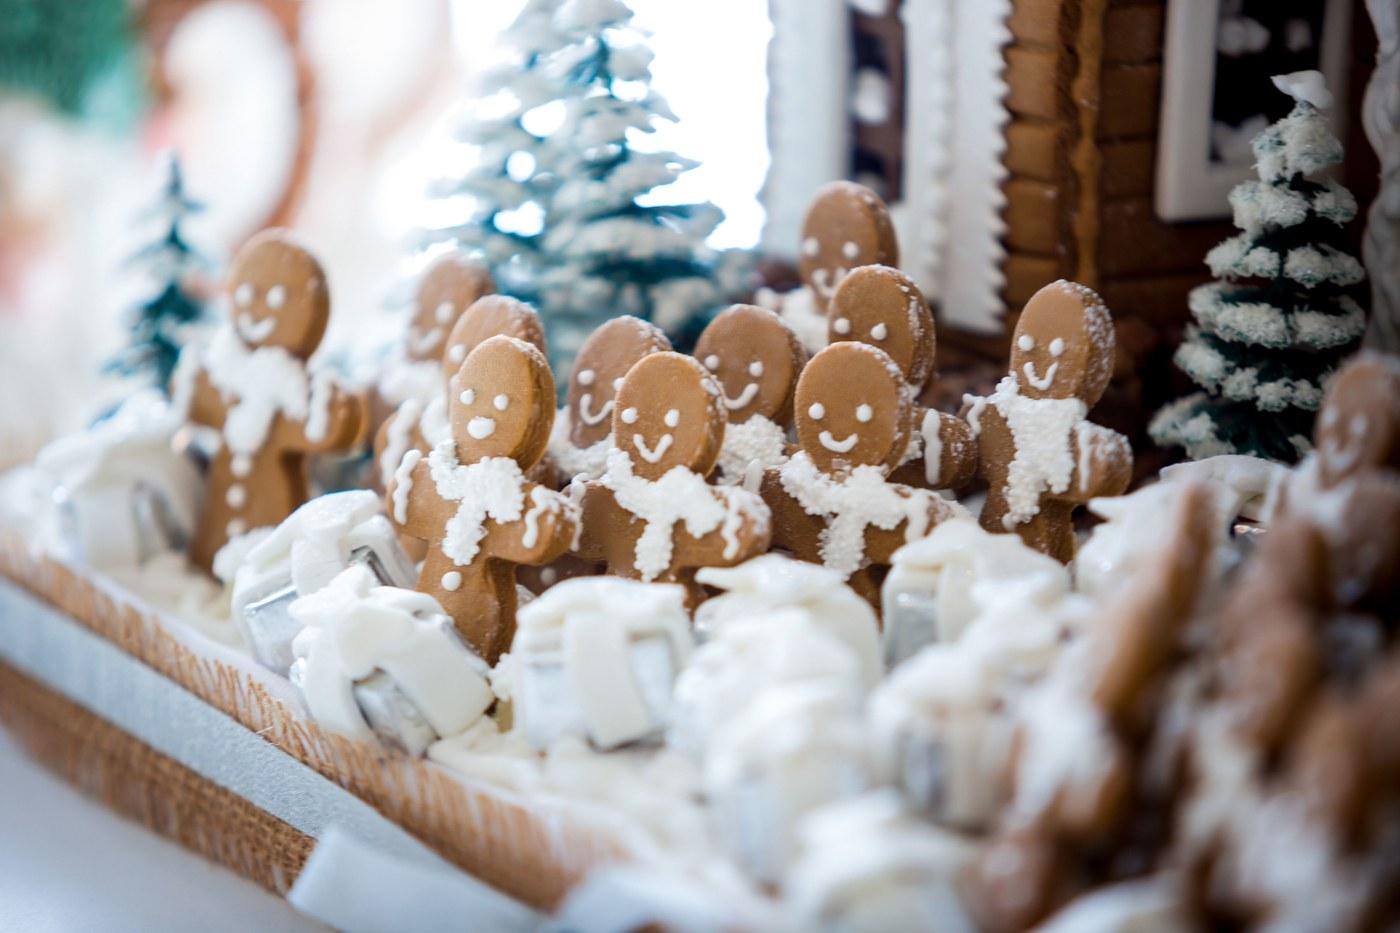 THESE ARE KRIS JENNER'S FAVOURITE CHRISTMAS HOME DESIGN IDEAS kris jenner 10 PHOTOS PROVING KRIS JENNER HAS THE COOLEST CHRISTMAS DECORATIONS kris jenner 15